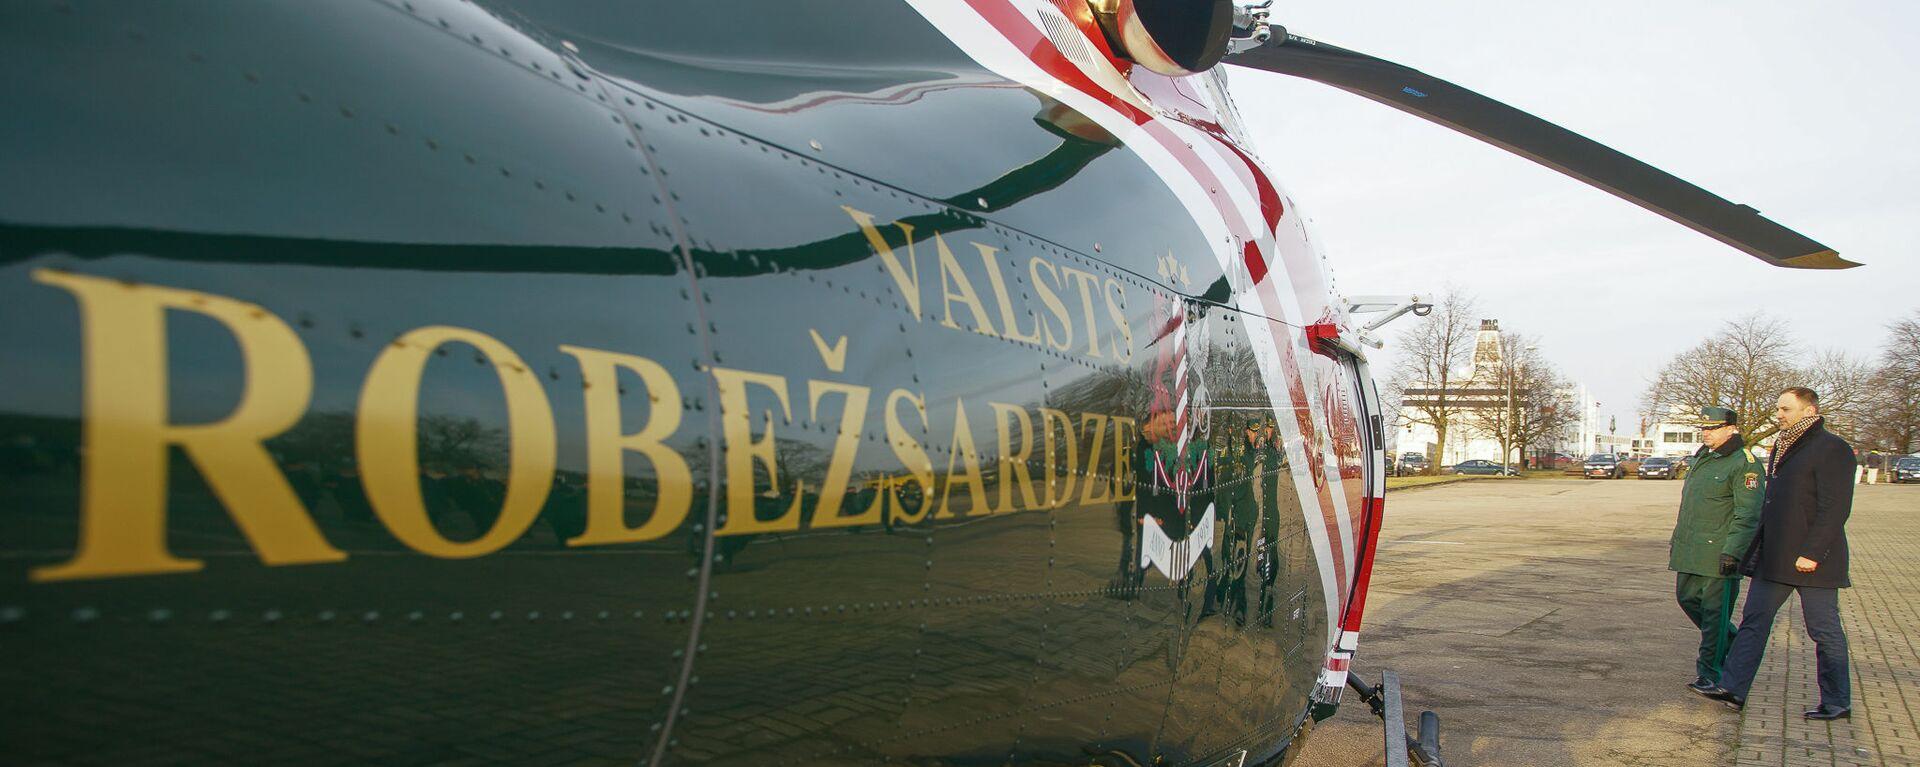 Глава МВД Сандис Гиргенс на церемонии приемки новых вертолетов AW 119 Kx  - Sputnik Латвия, 1920, 06.03.2020